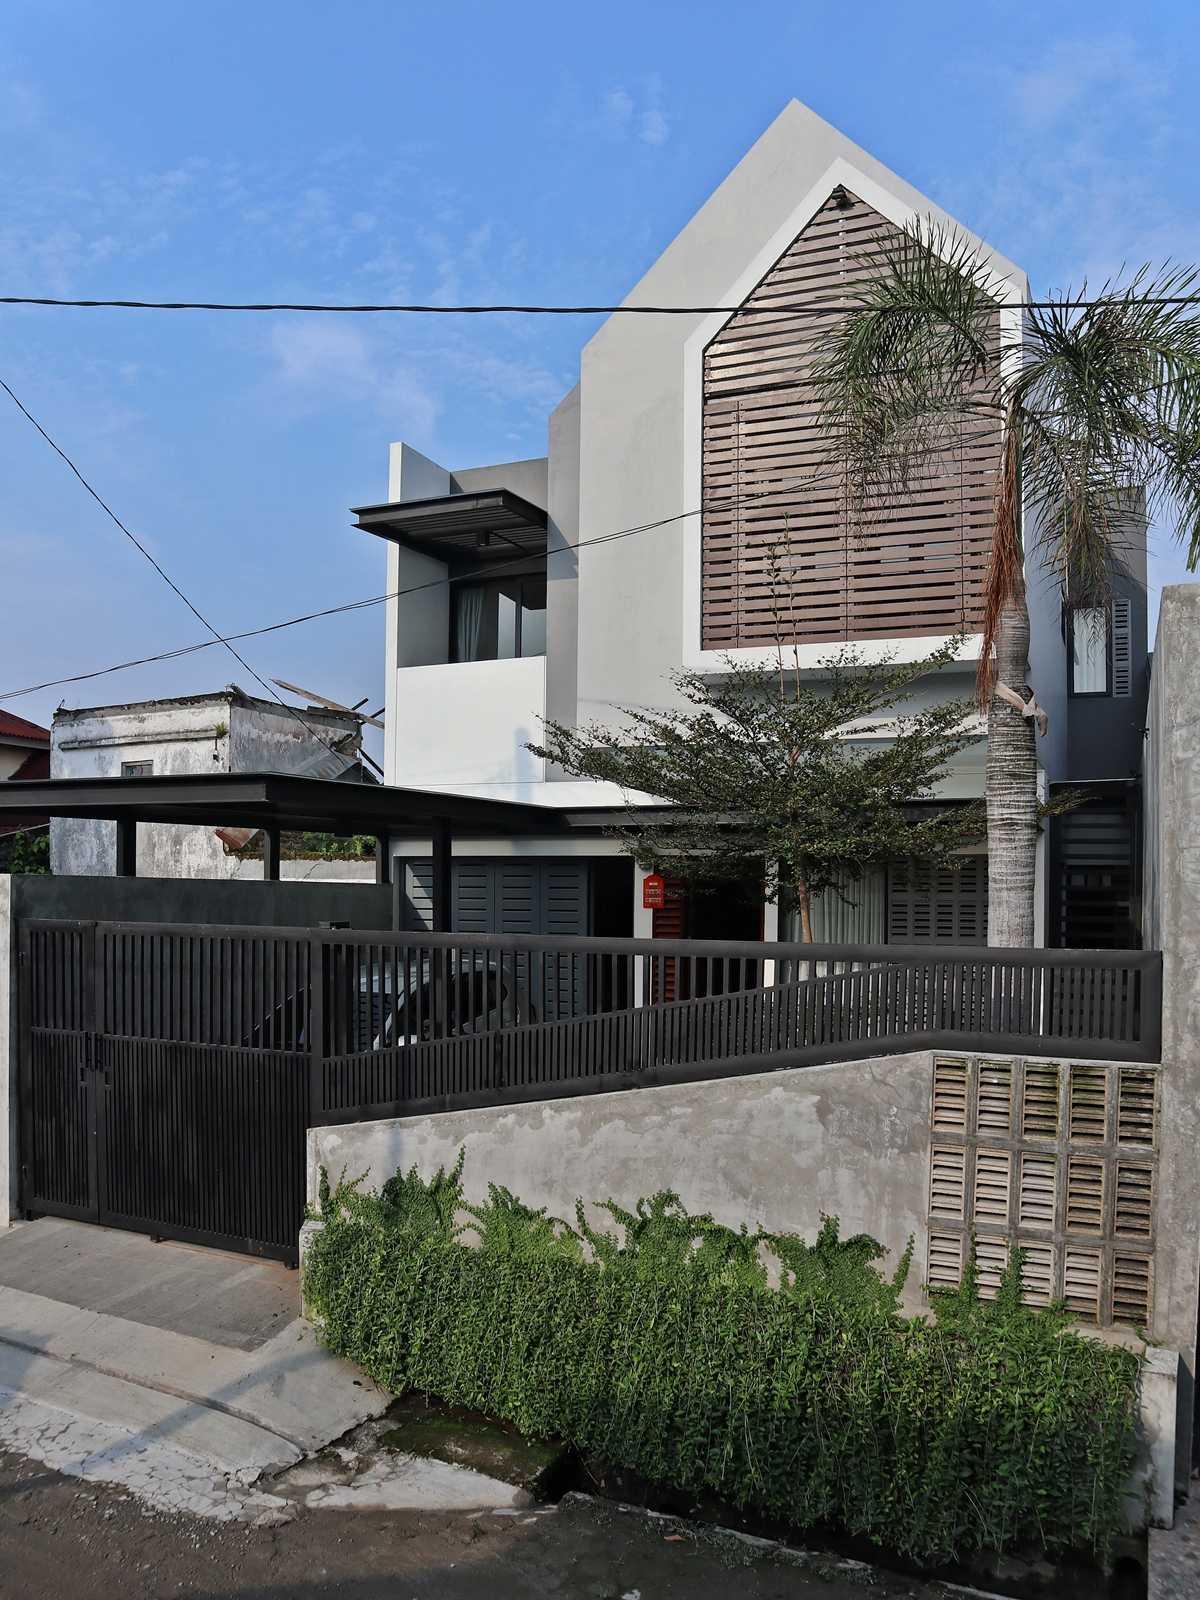 Bd Studio Ls House Medan, Kota Medan, Sumatera Utara, Indonesia Medan, Kota Medan, Sumatera Utara, Indonesia Bd-Studio-Ls-House   73792